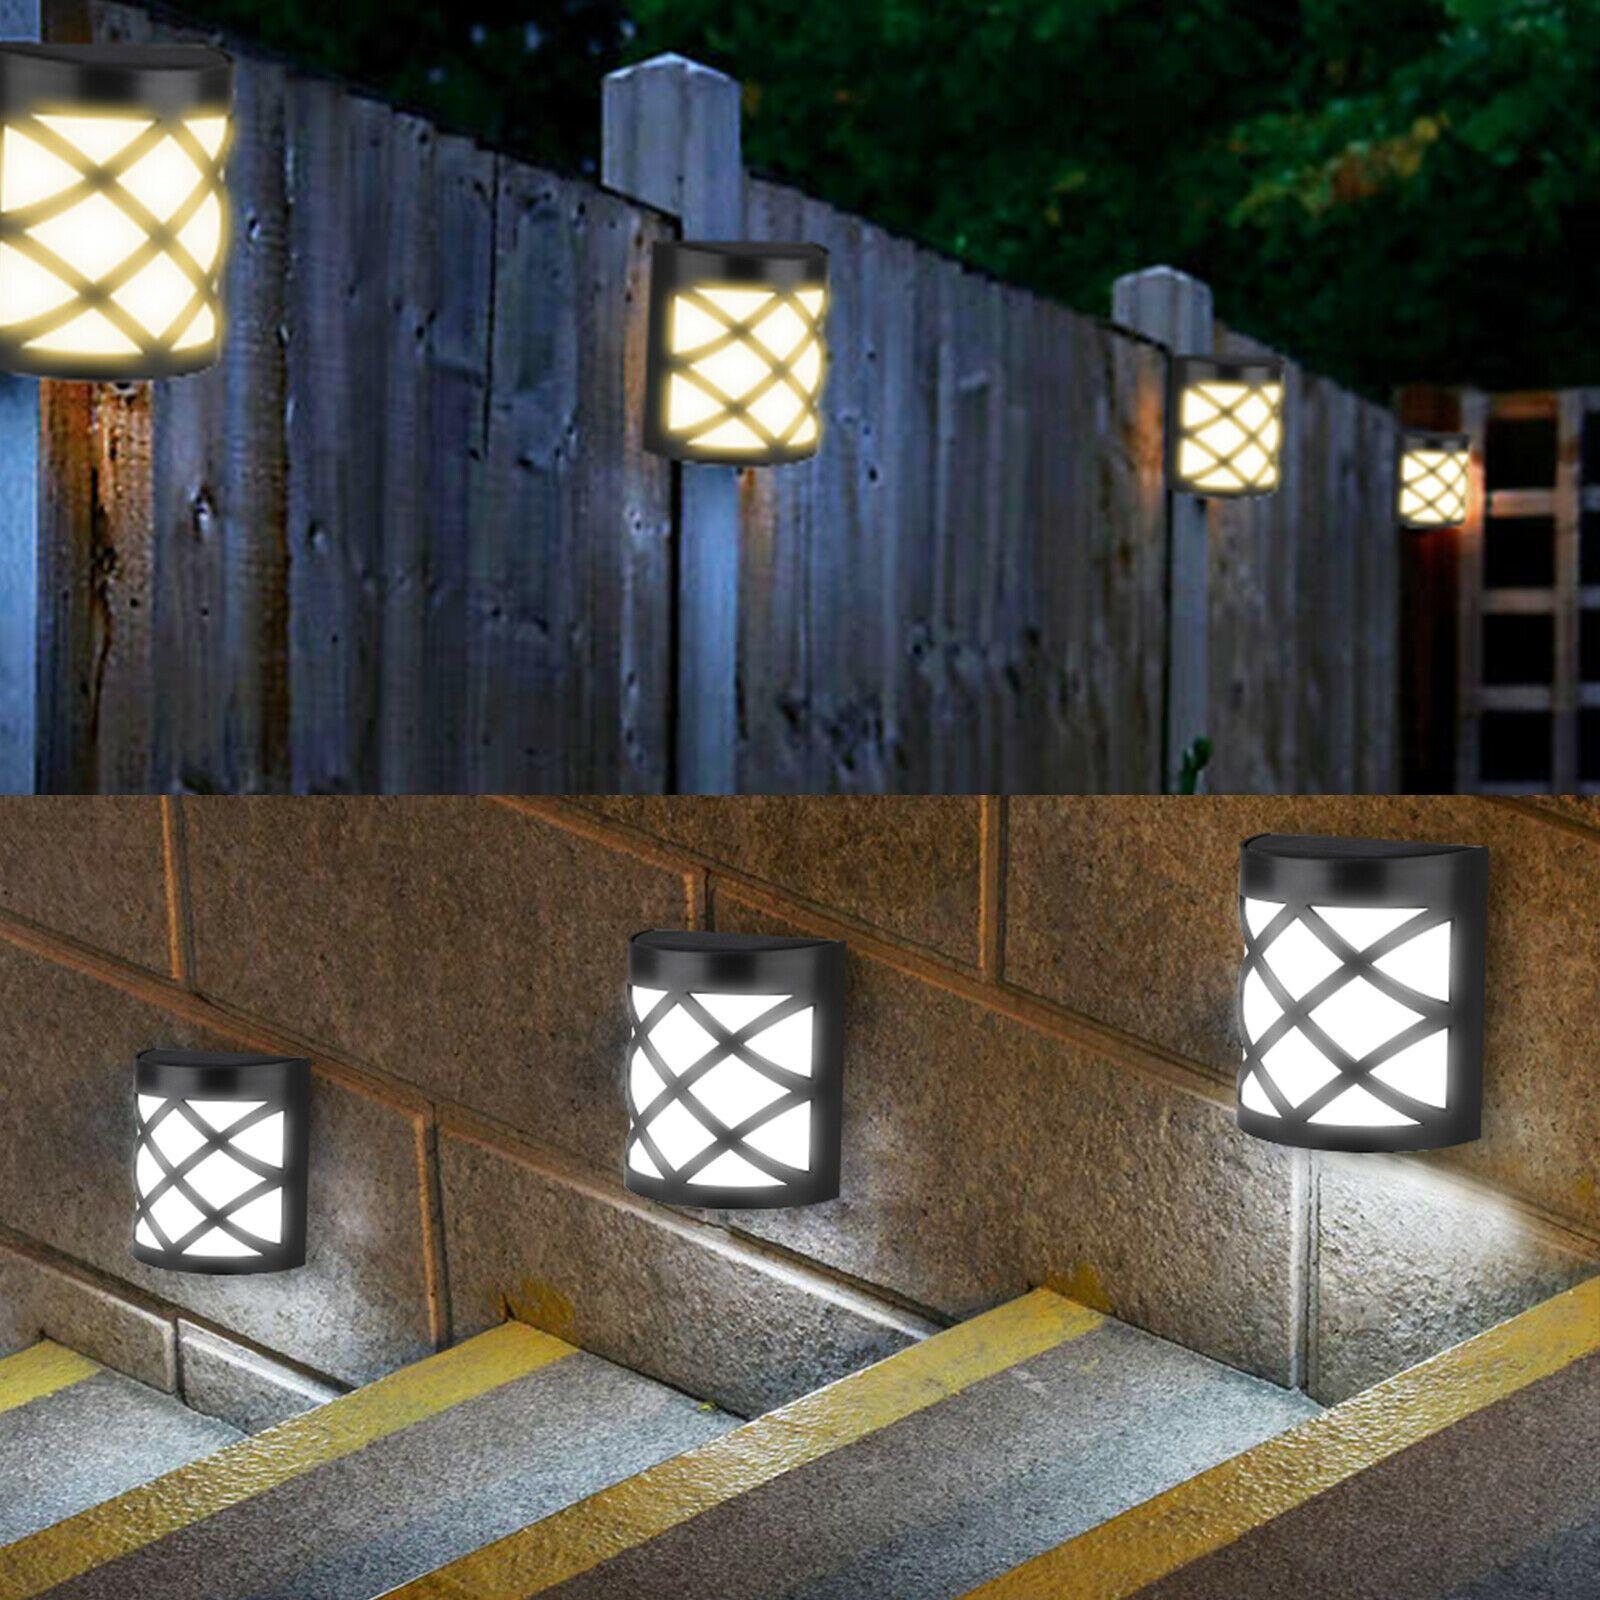 Solar 6 Led Deck Light Outdoor Waterproof With Retro Design Motion Sensor Lamp 7 99 Outdoor Lighting In 2020 Solar Lamp Outdoor Solar Lanterns Outdoor Solar Lights